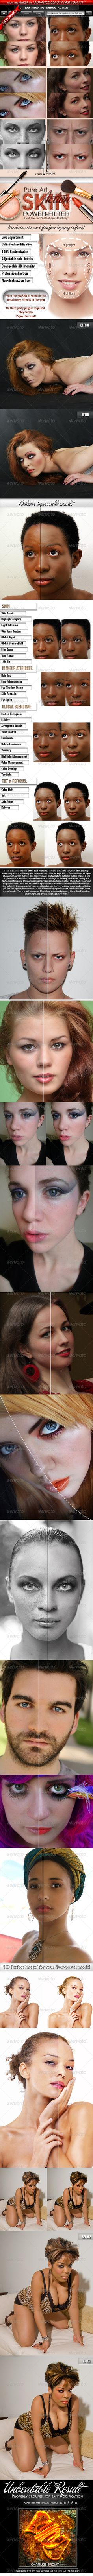 Pure Art Skin Power Filter  #GraphicRiver #contour